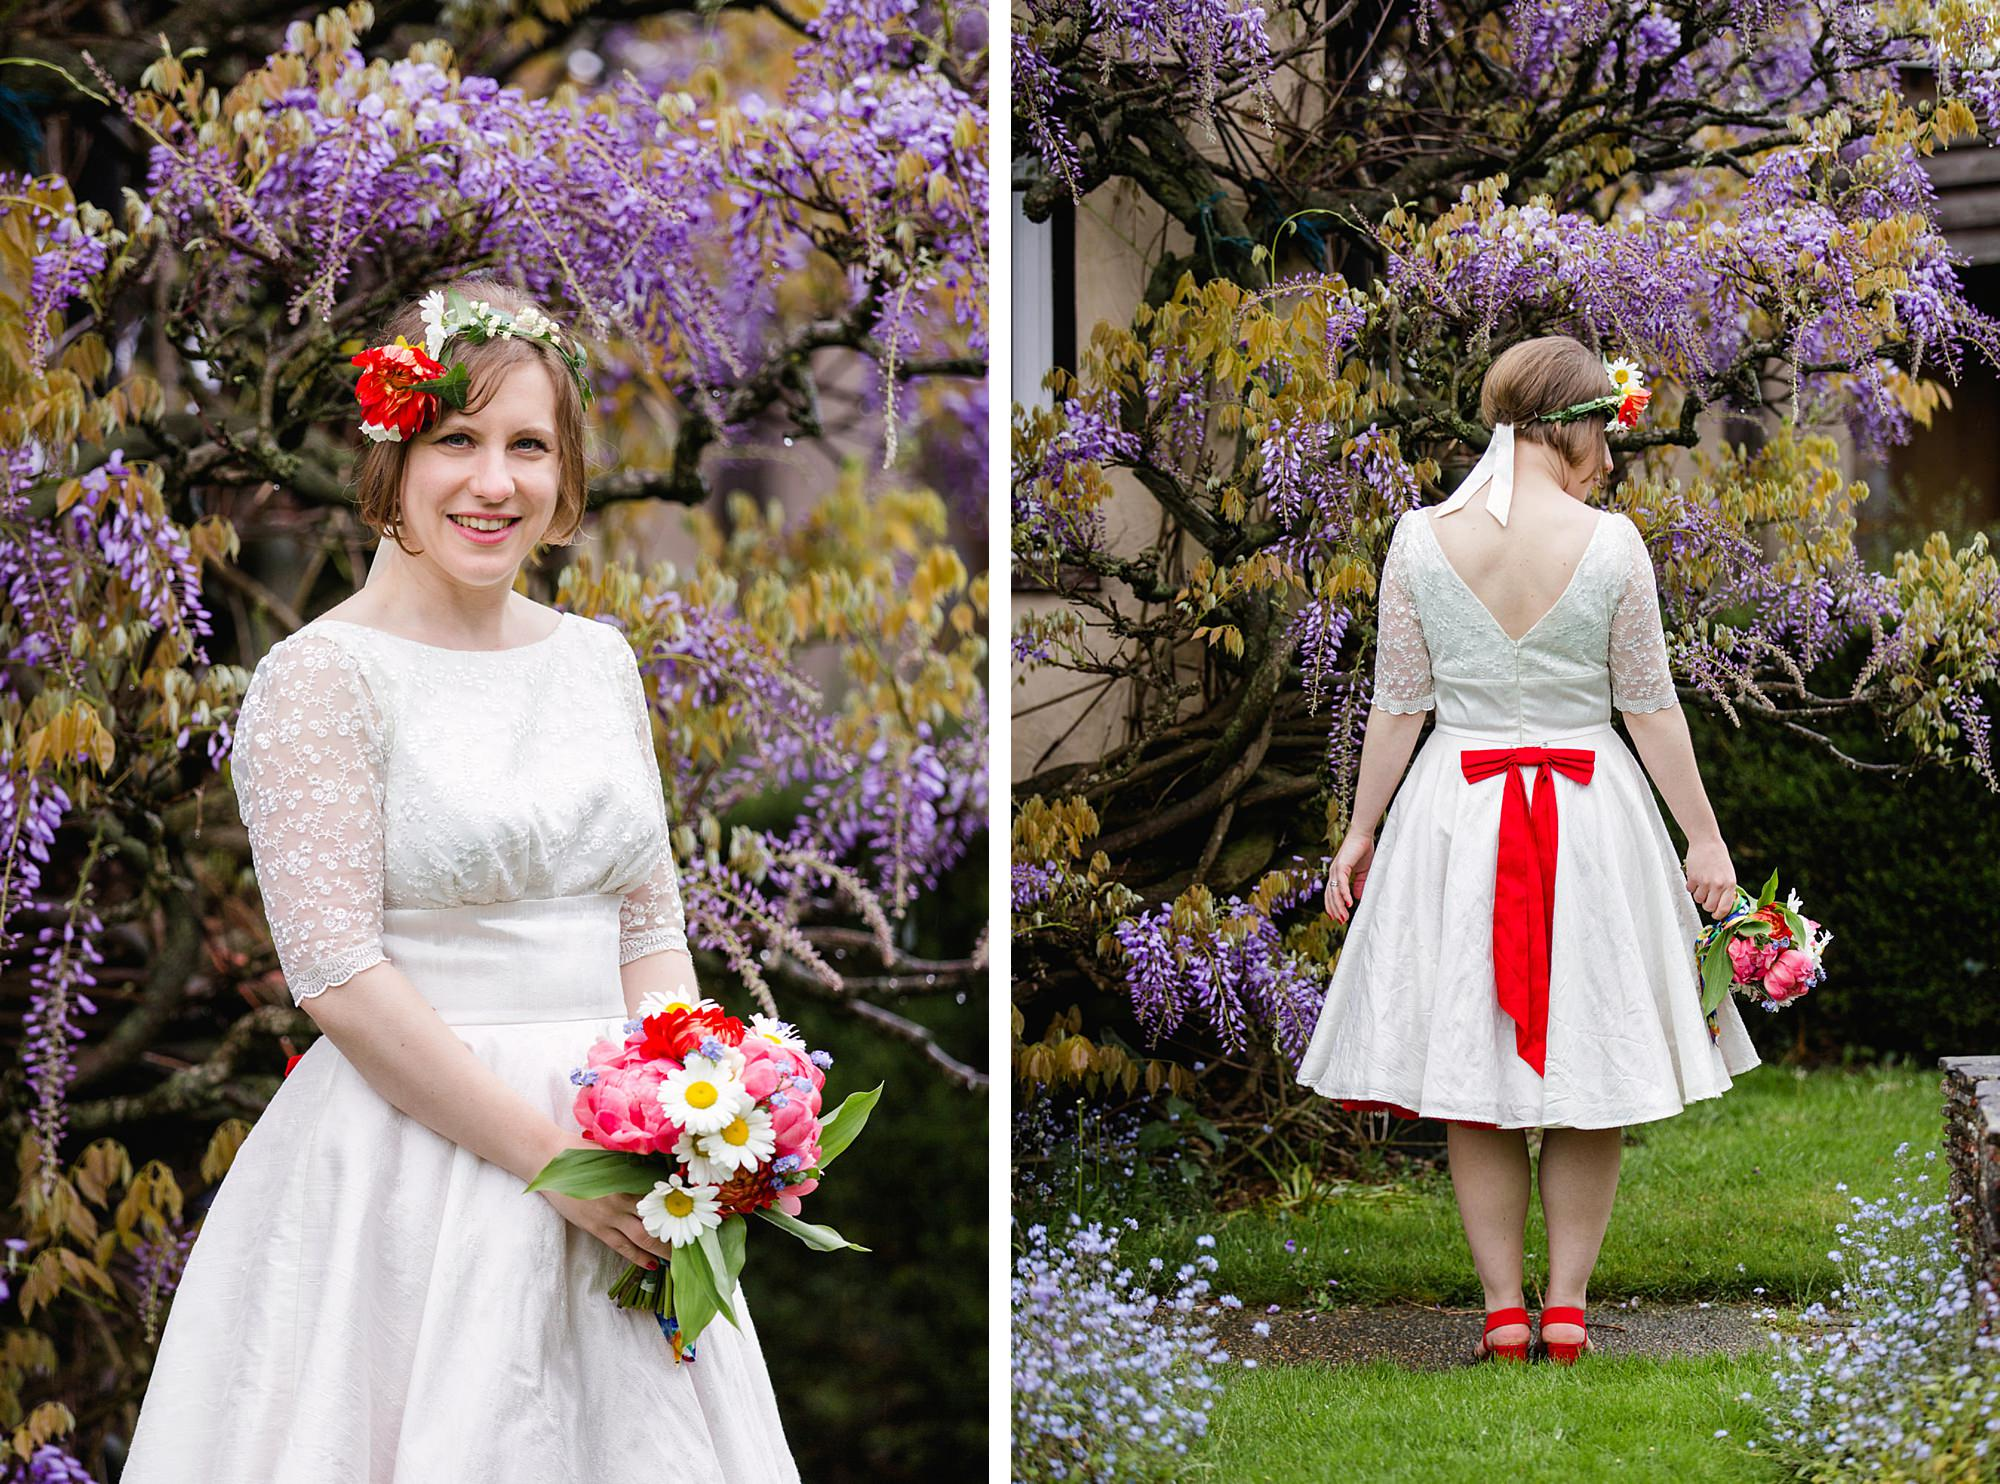 portrait of bride wearing flower crown with vintage b=dress by wisteria at Fun DIY wedding